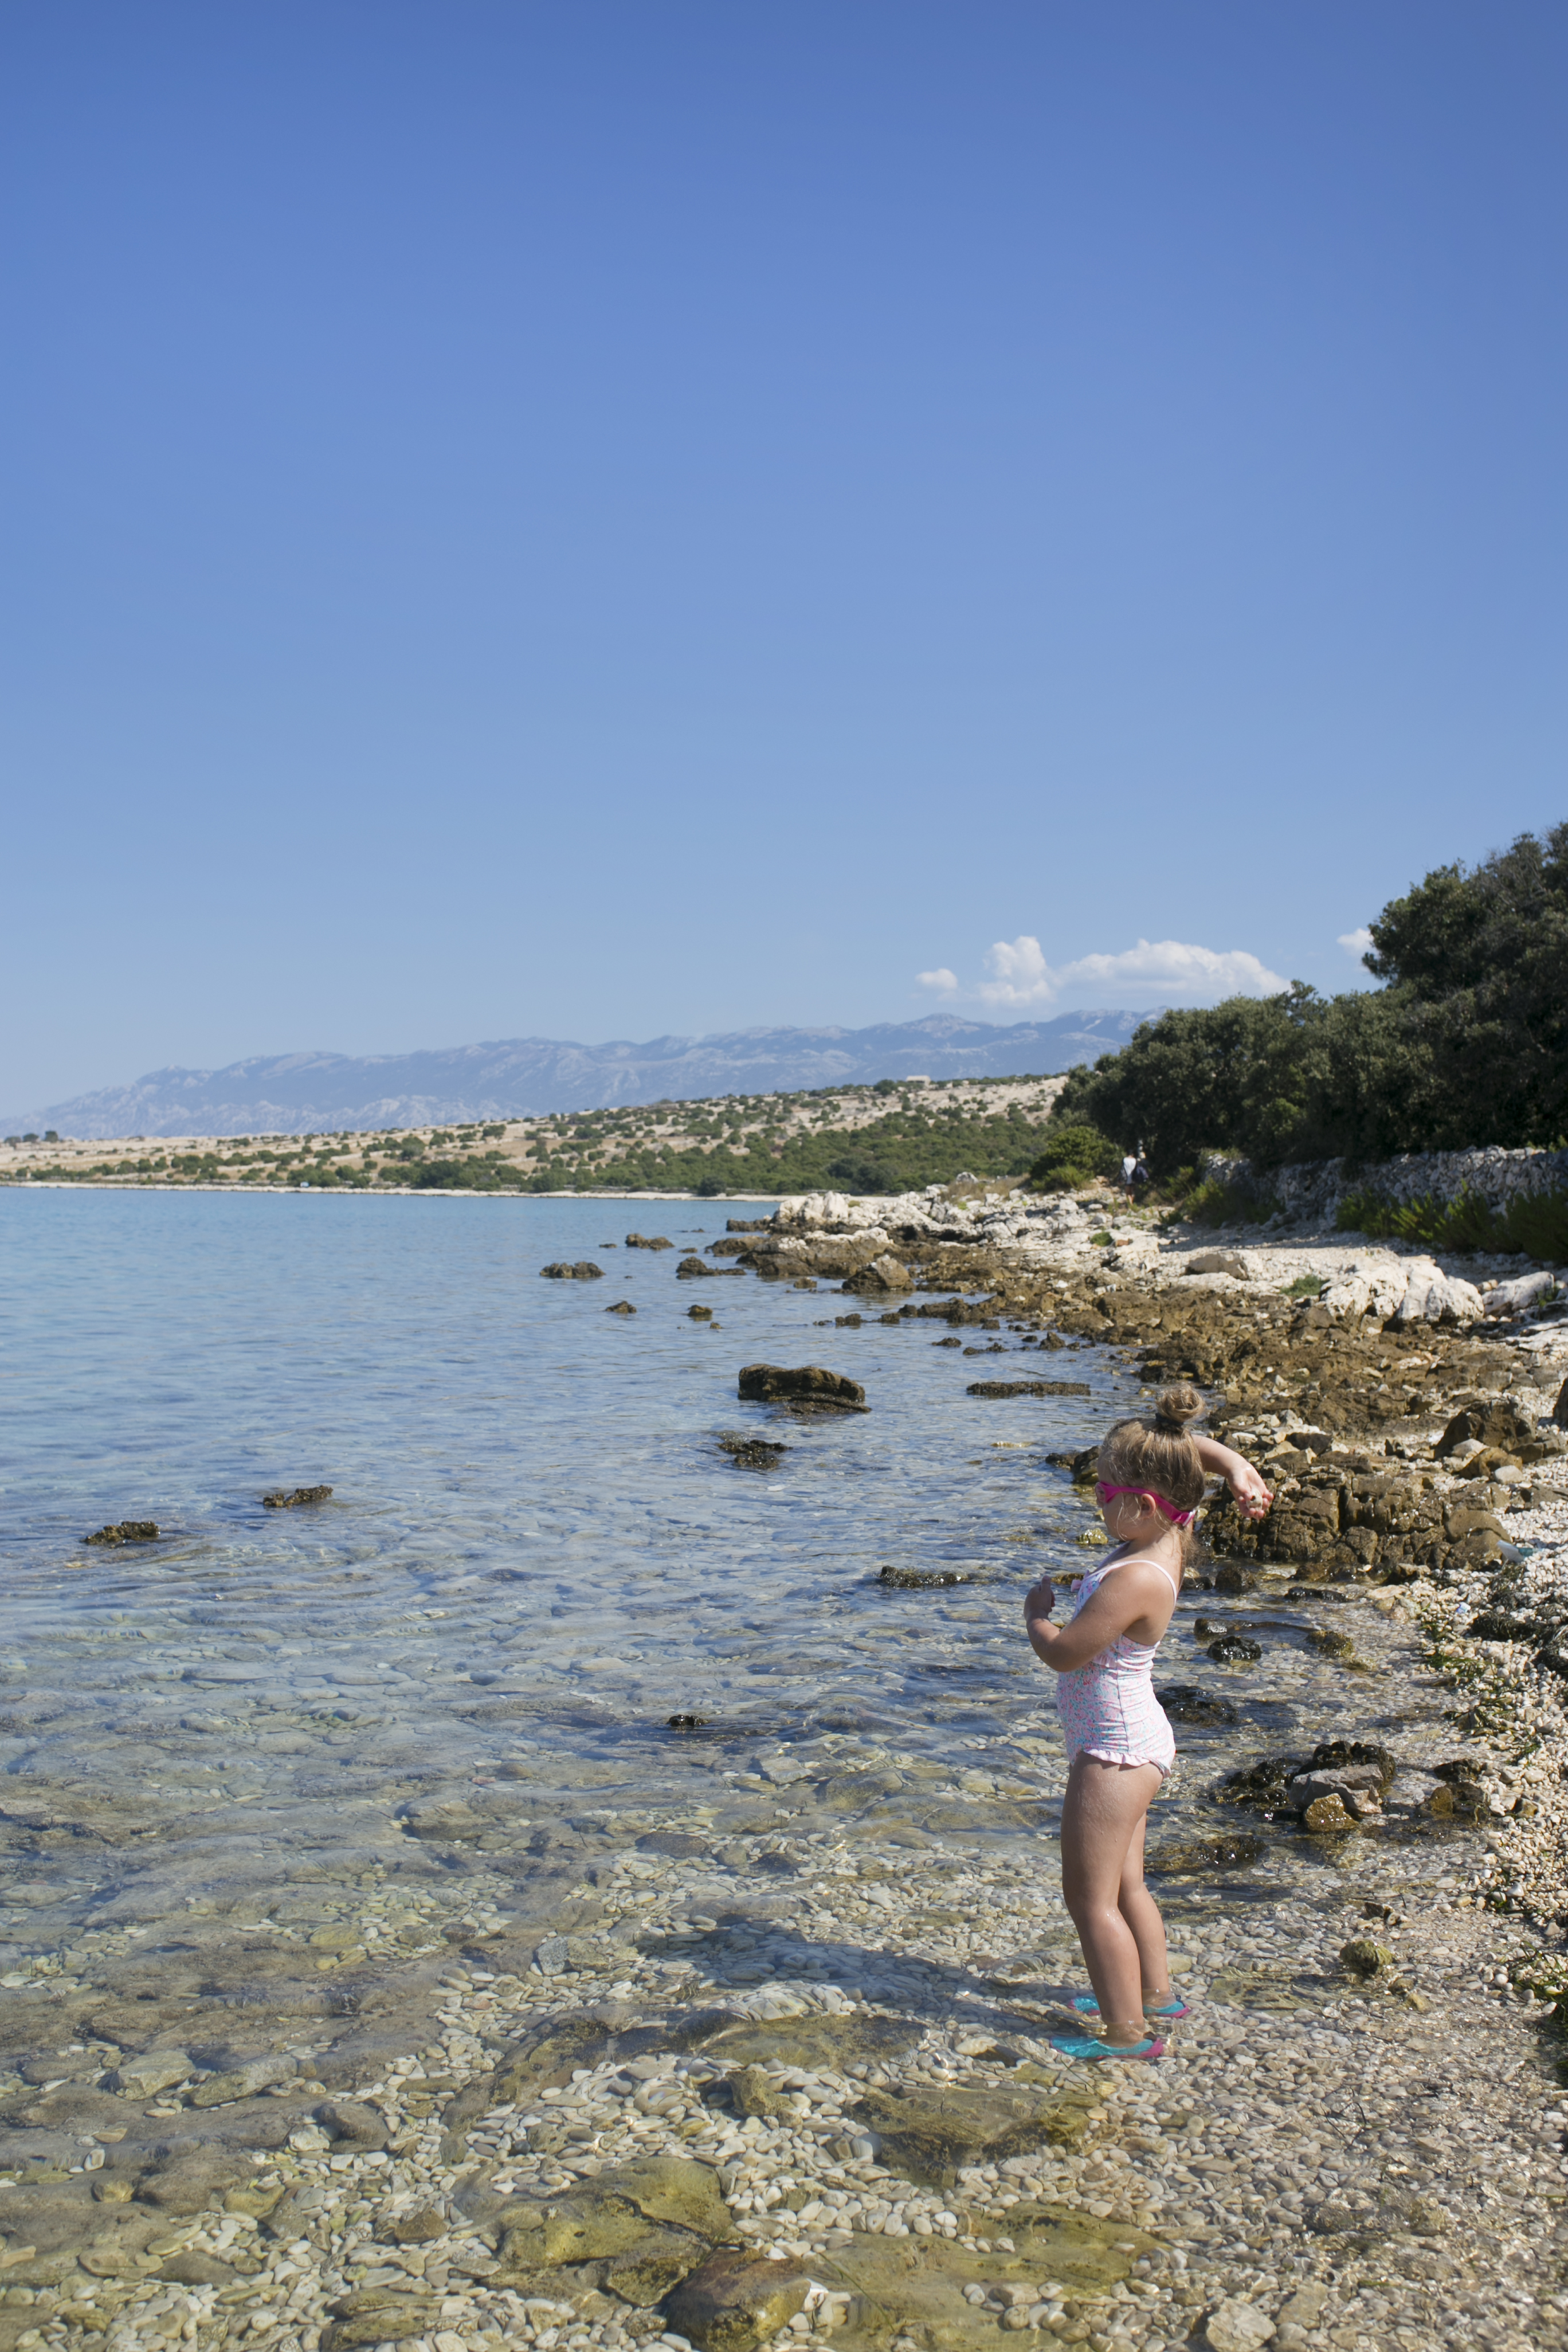 Gierenica plaża, Chorwacja plaża, Pag plaża